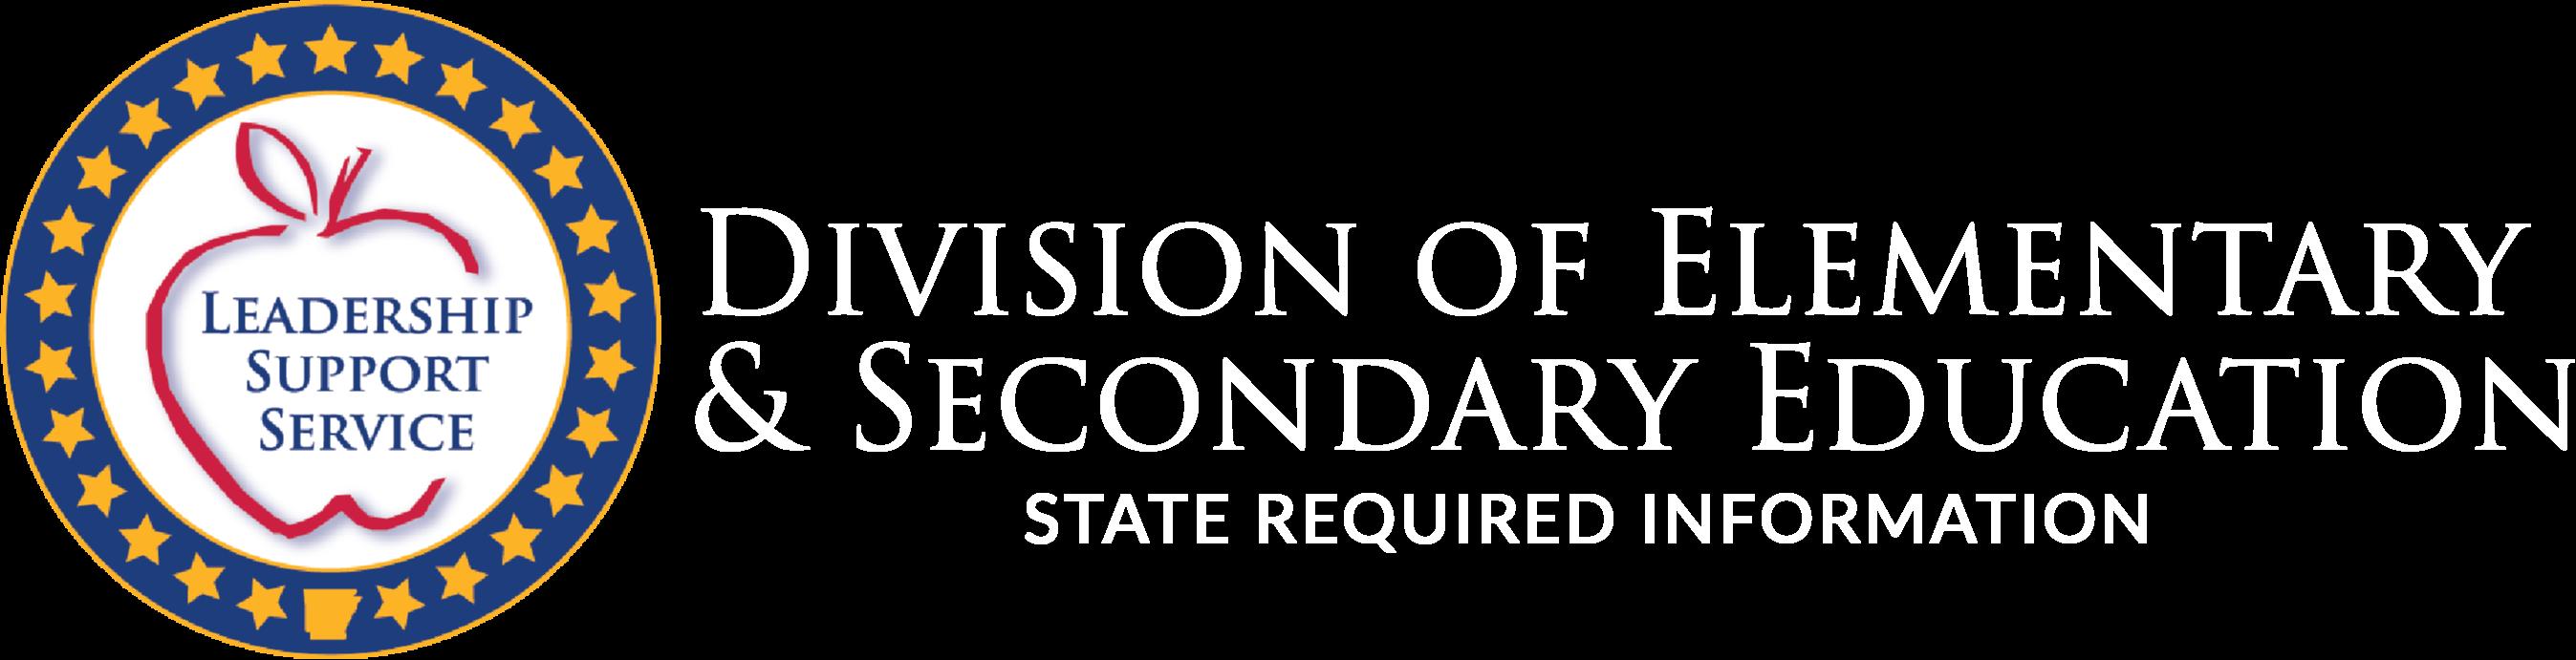 state docs